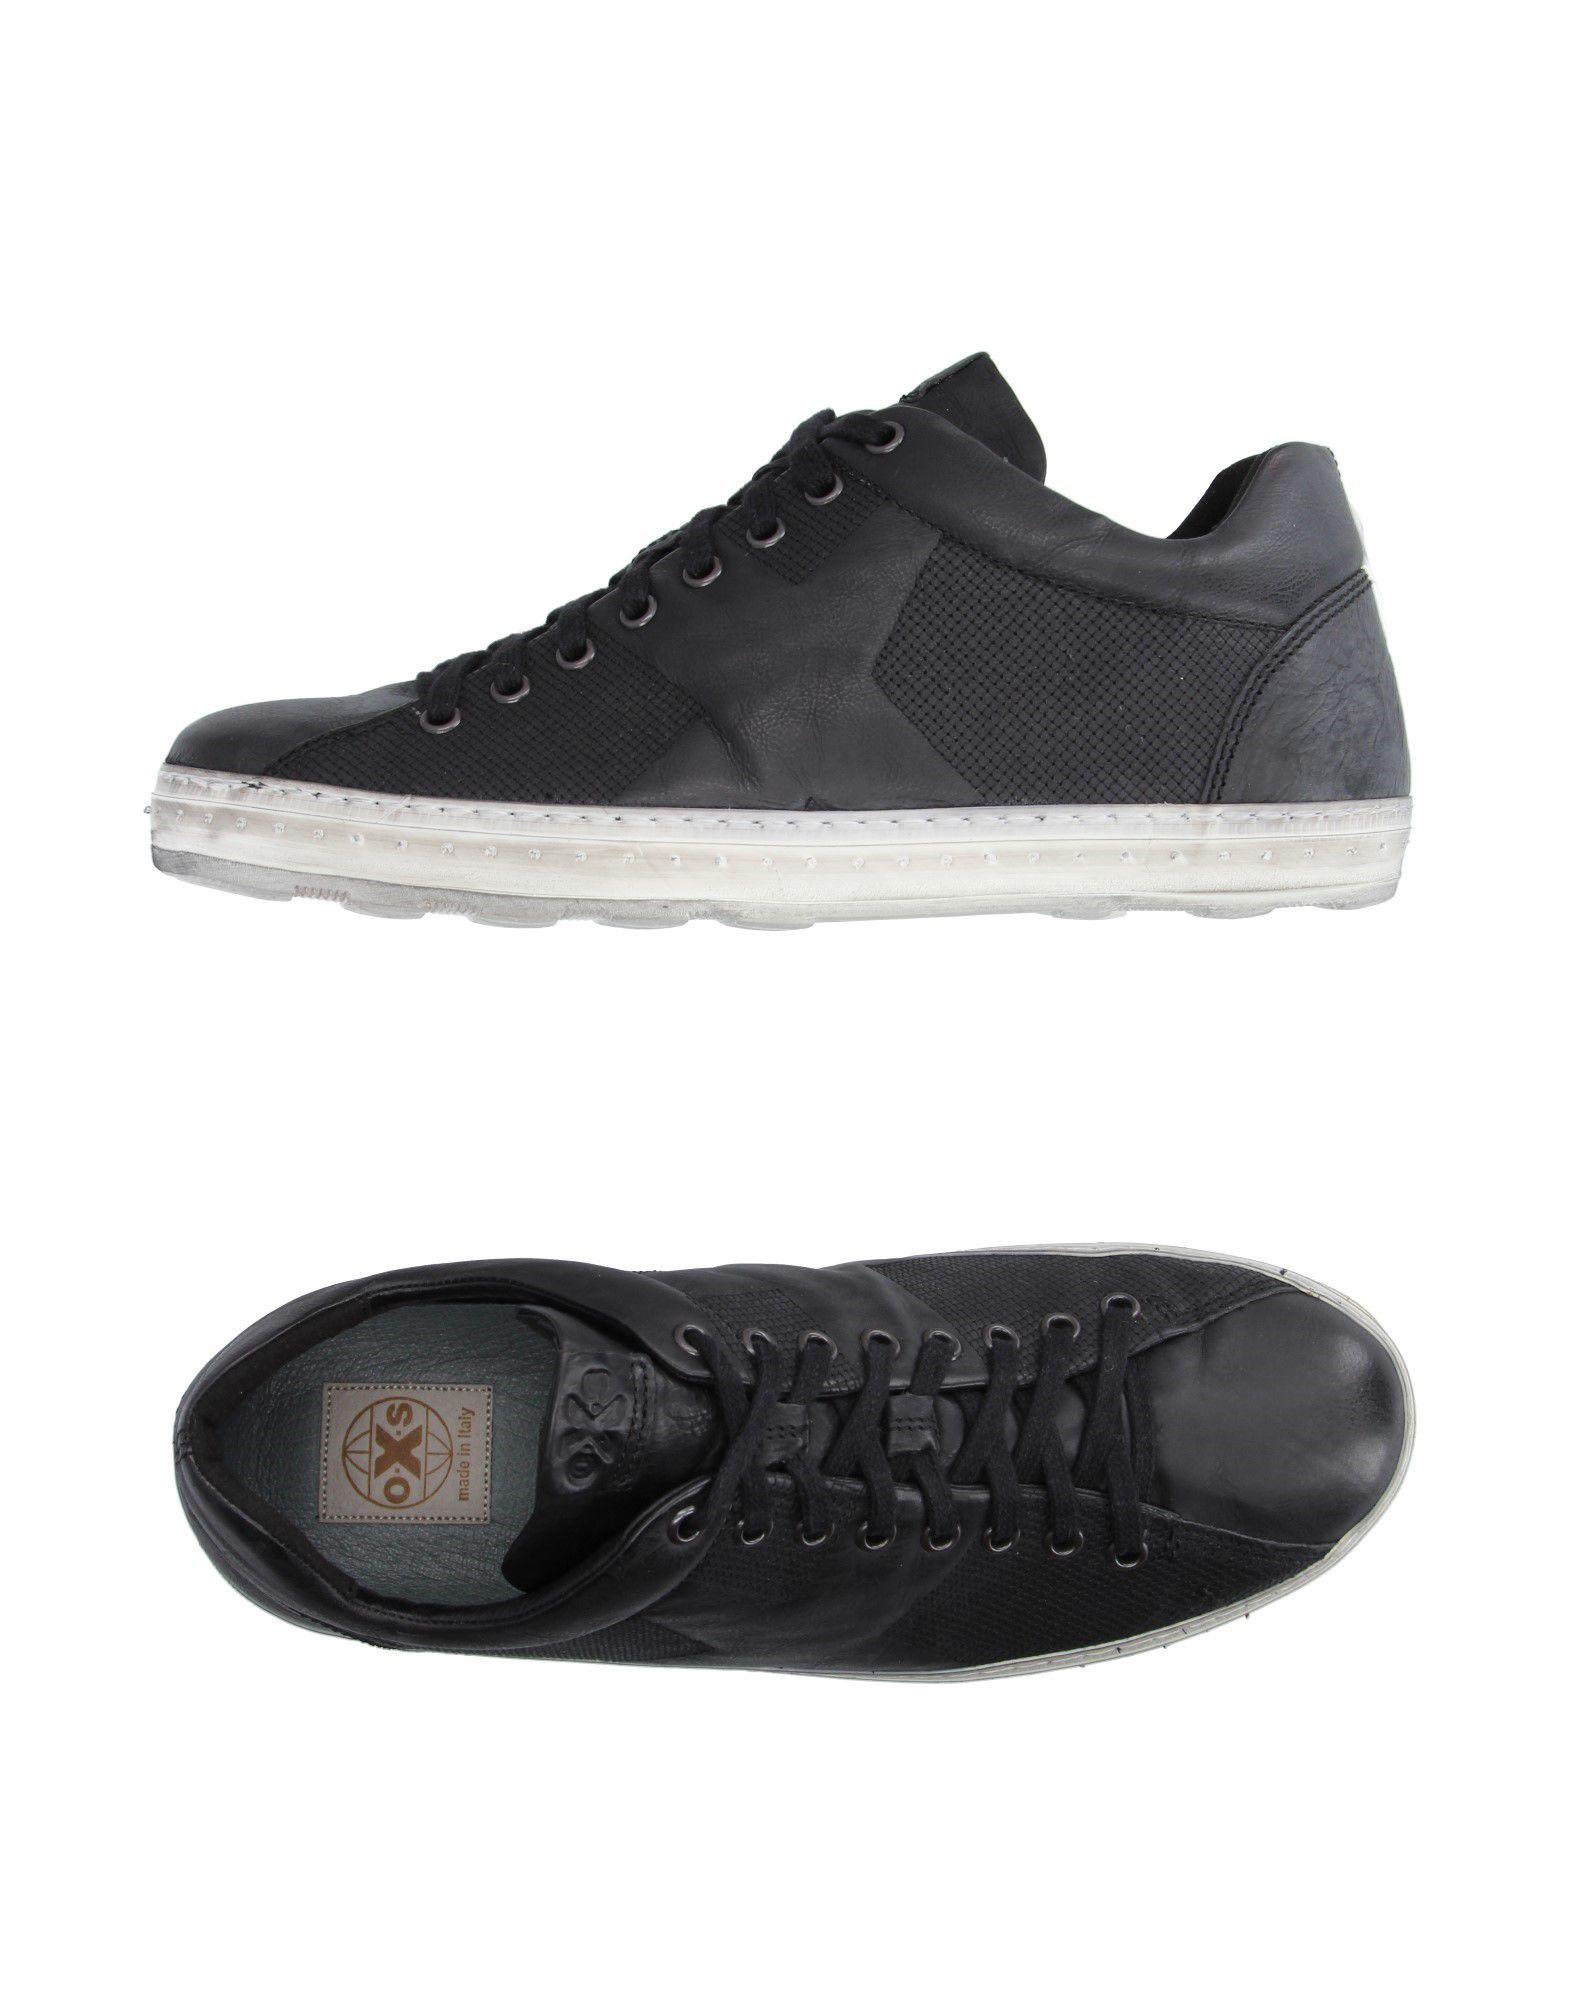 Haltbare Mode billige Schuhe O.X.S. Sneakers Herren  11113066ST Heiße Schuhe